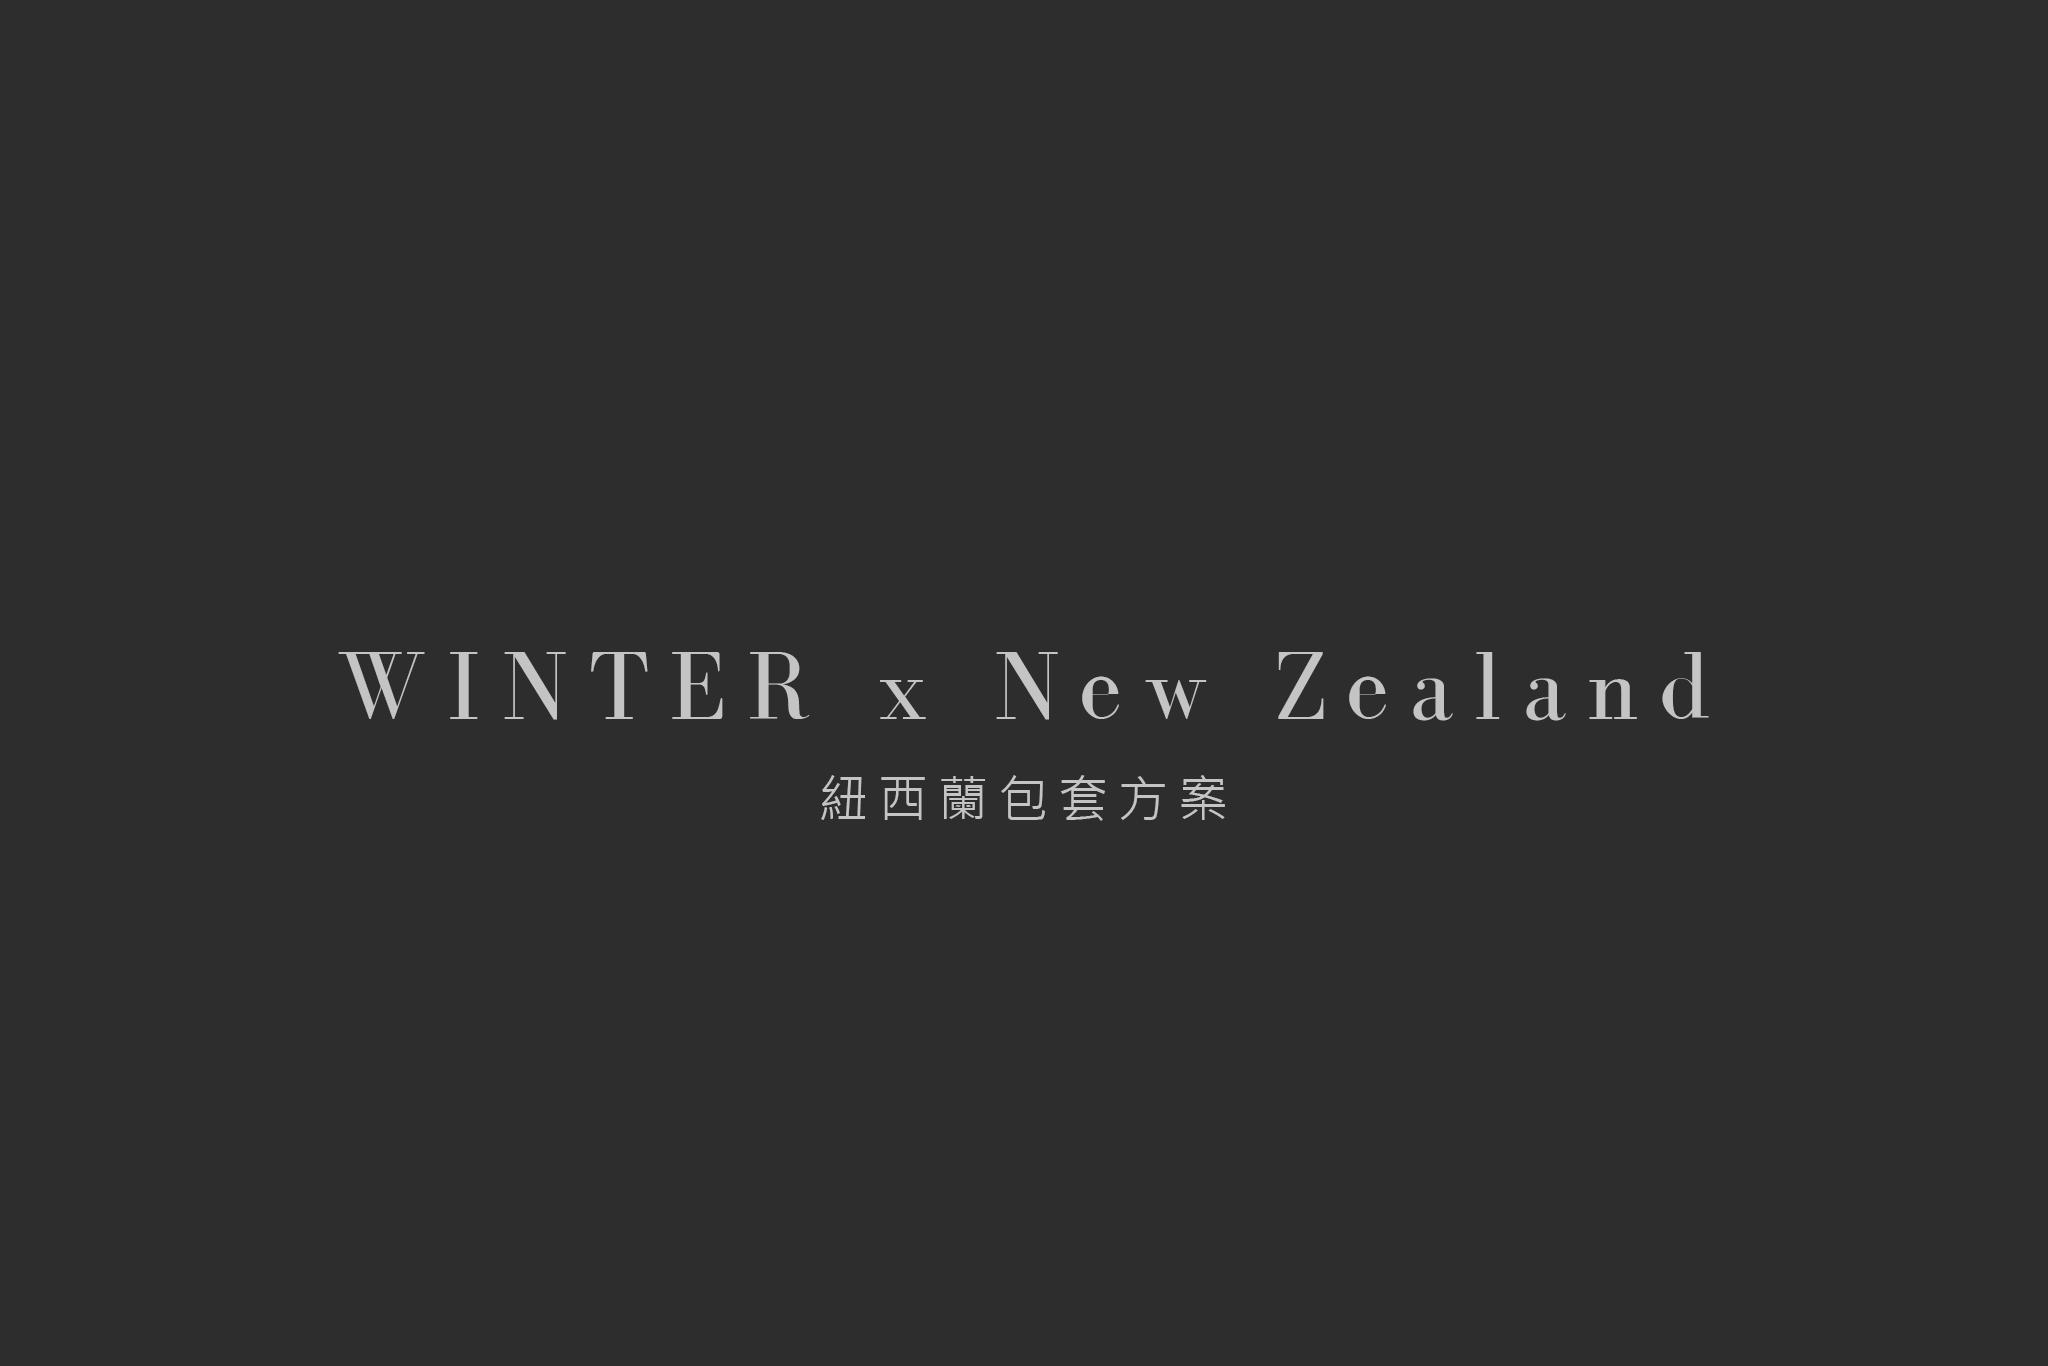 WINTER x New Zealand